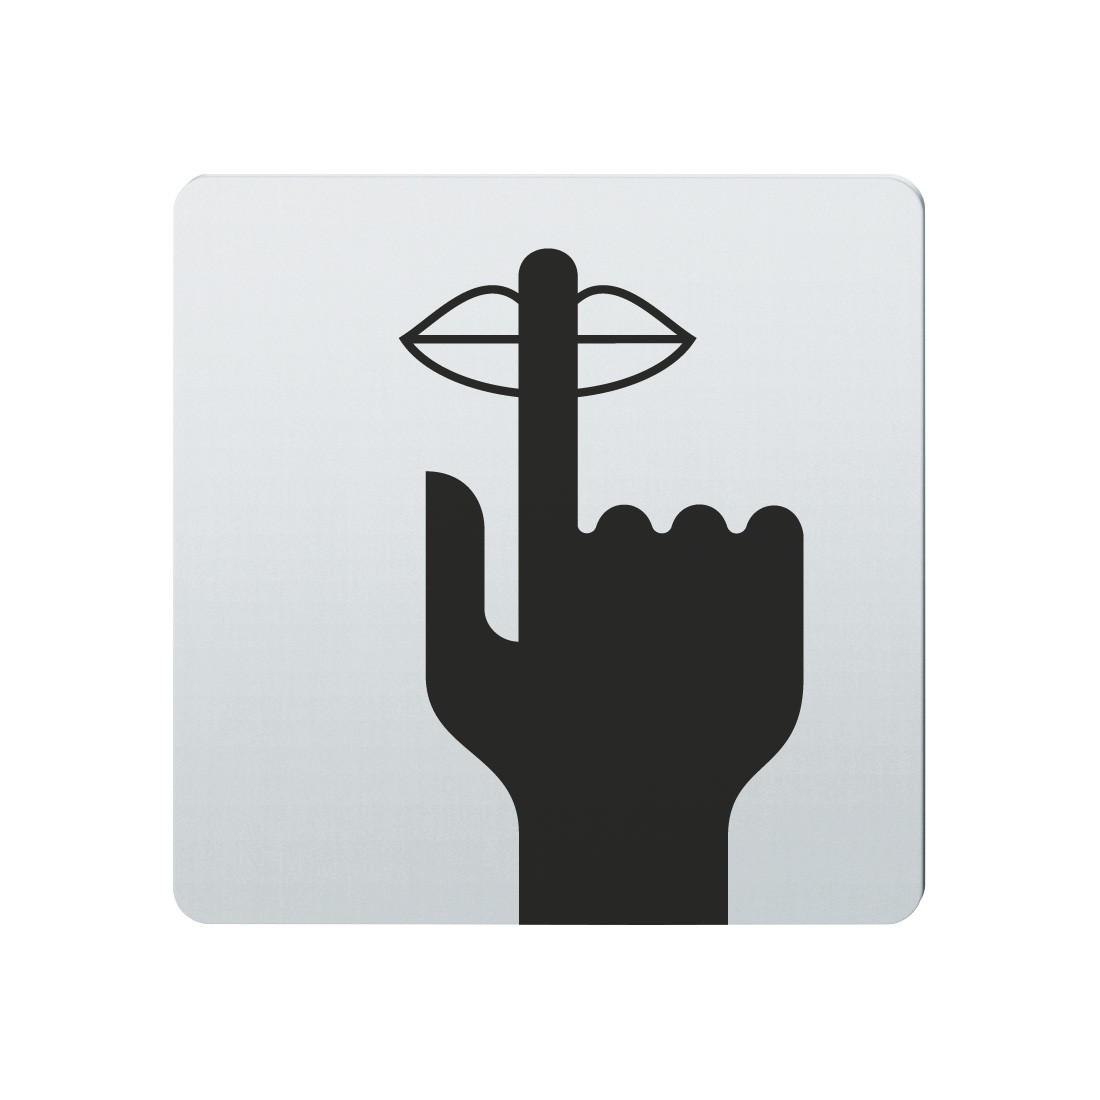 FSB Hinweiszeichen Bitte Ruhe Lasergraviert Edelstahl fein matt (0 36 4059 00041 6204)